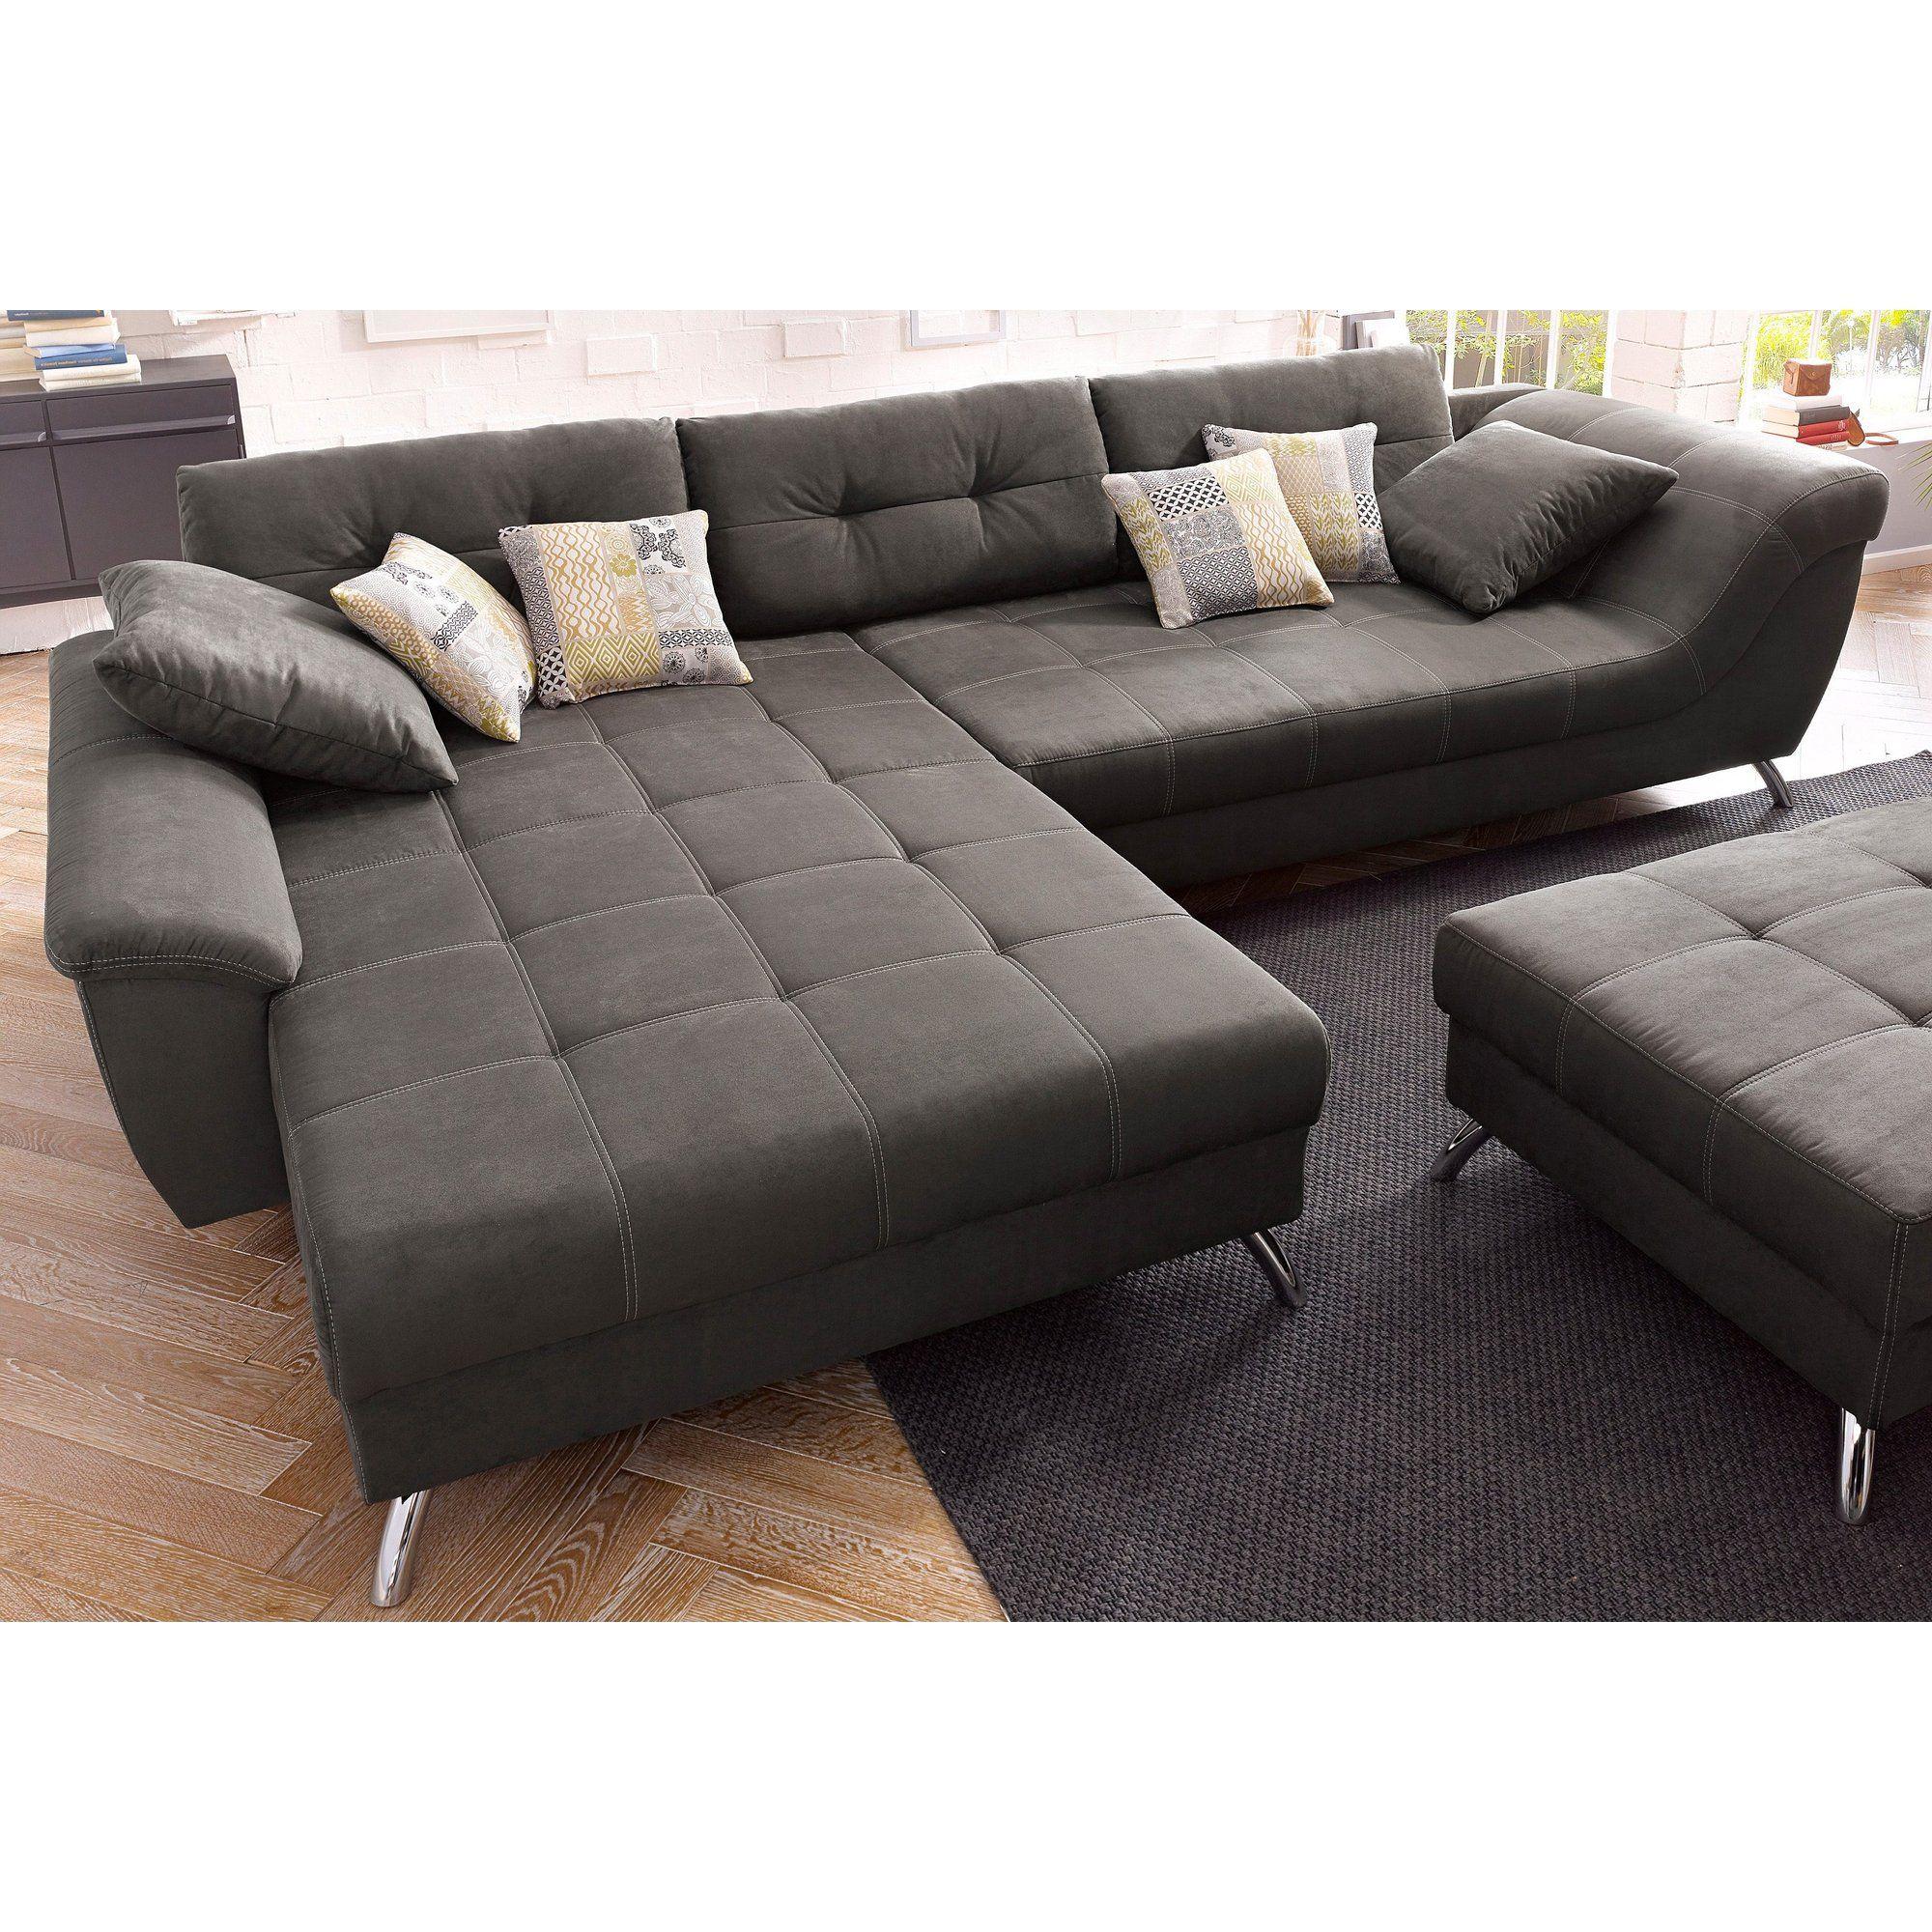 Canapé d angle avec méri nne modulable Un style tr¨s contemporain